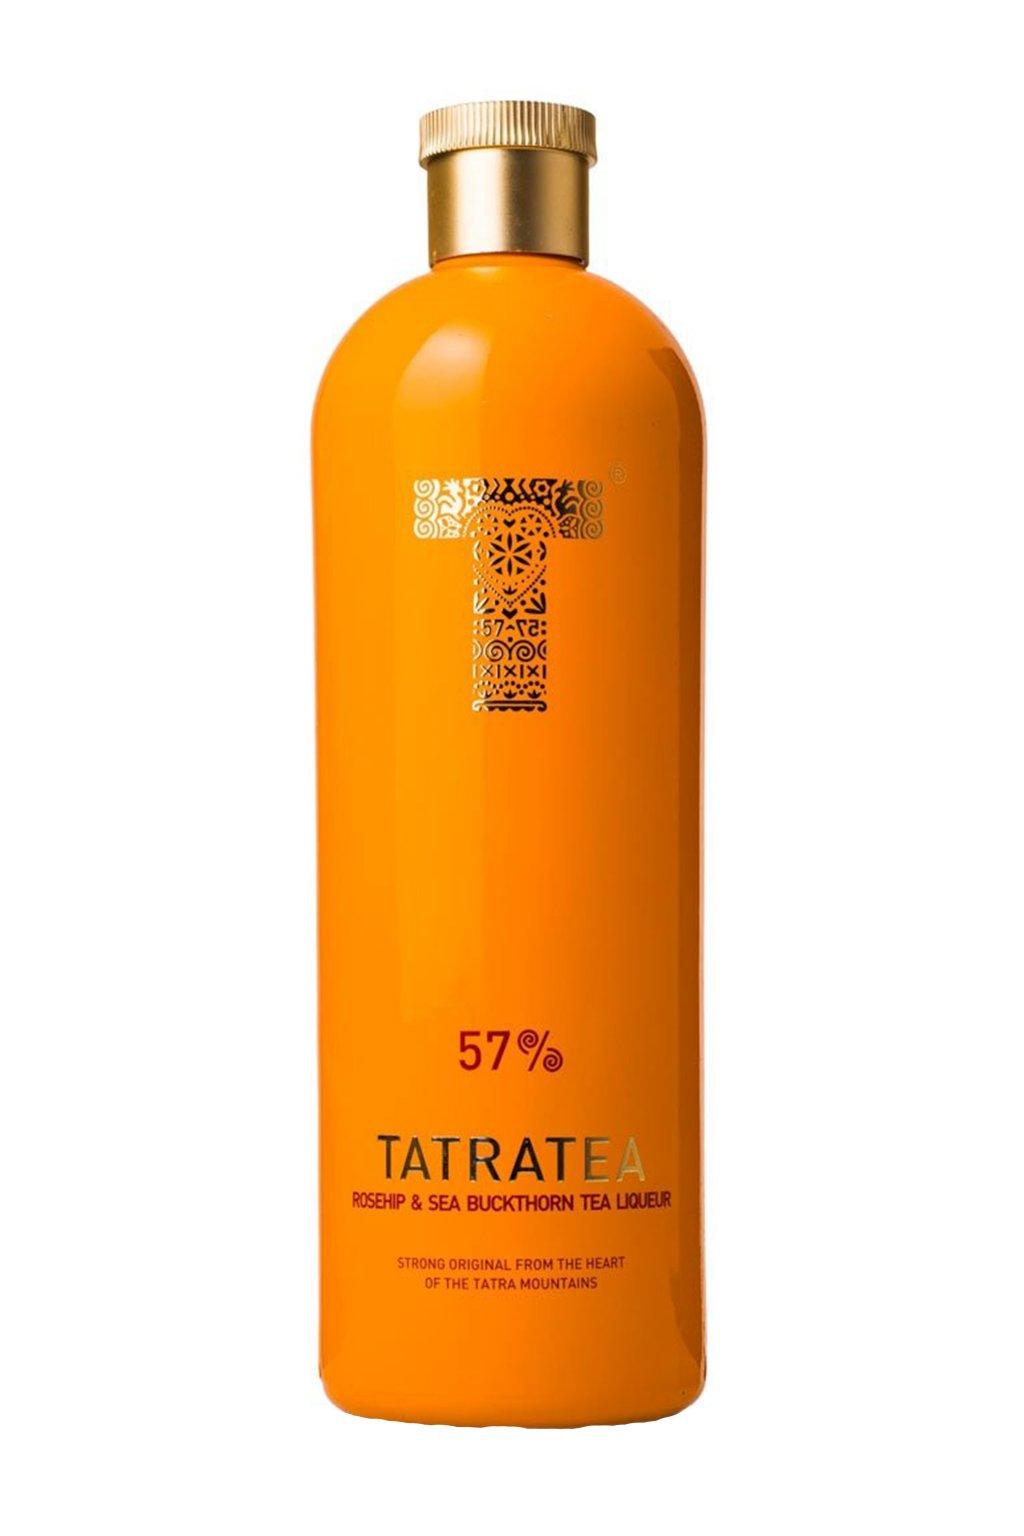 Tatratea 57%